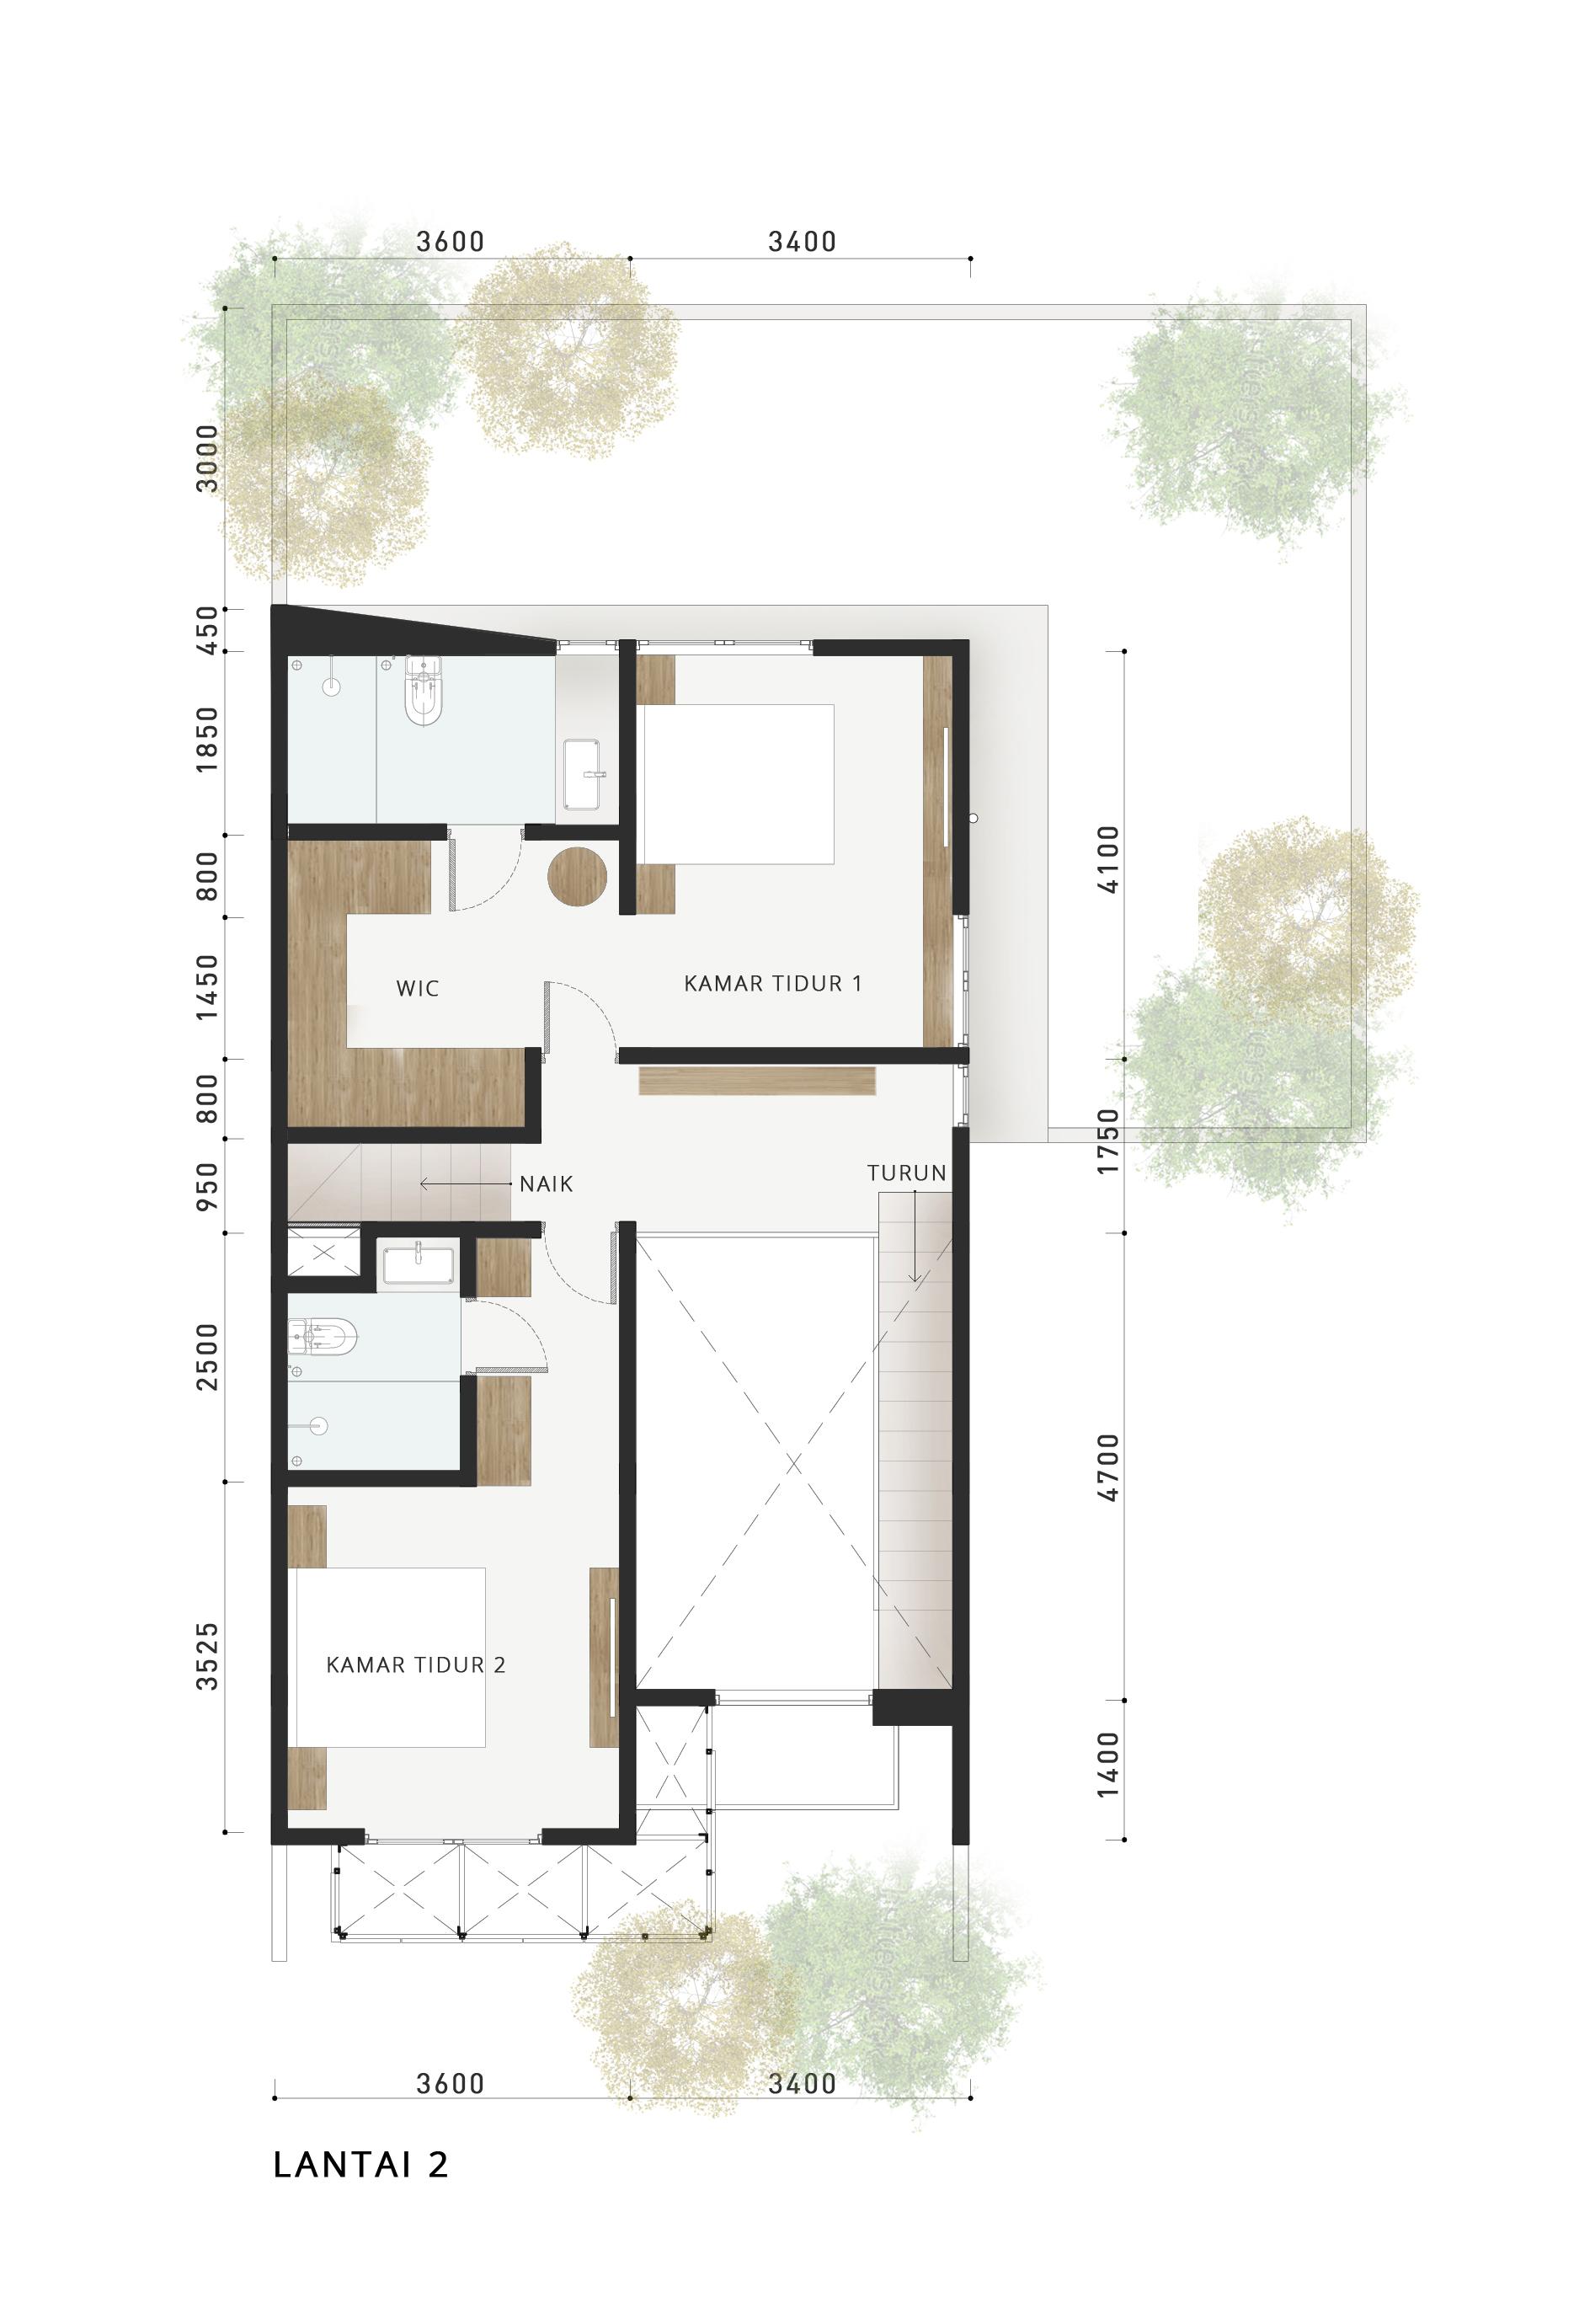 LUX lantai 2.jpg